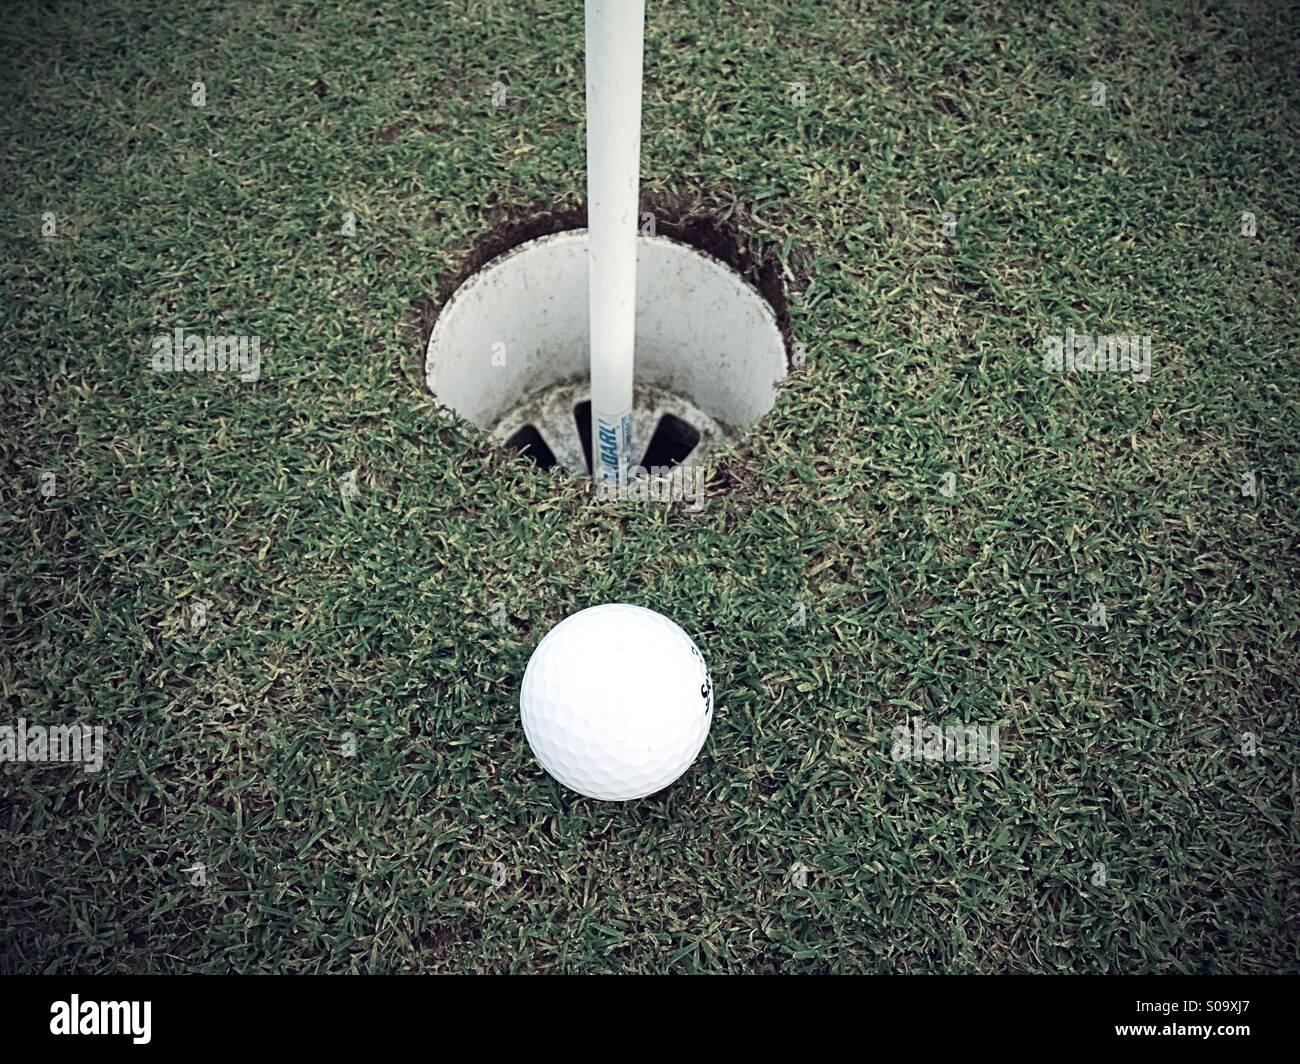 Pelota de golf cerca al agujero Imagen De Stock